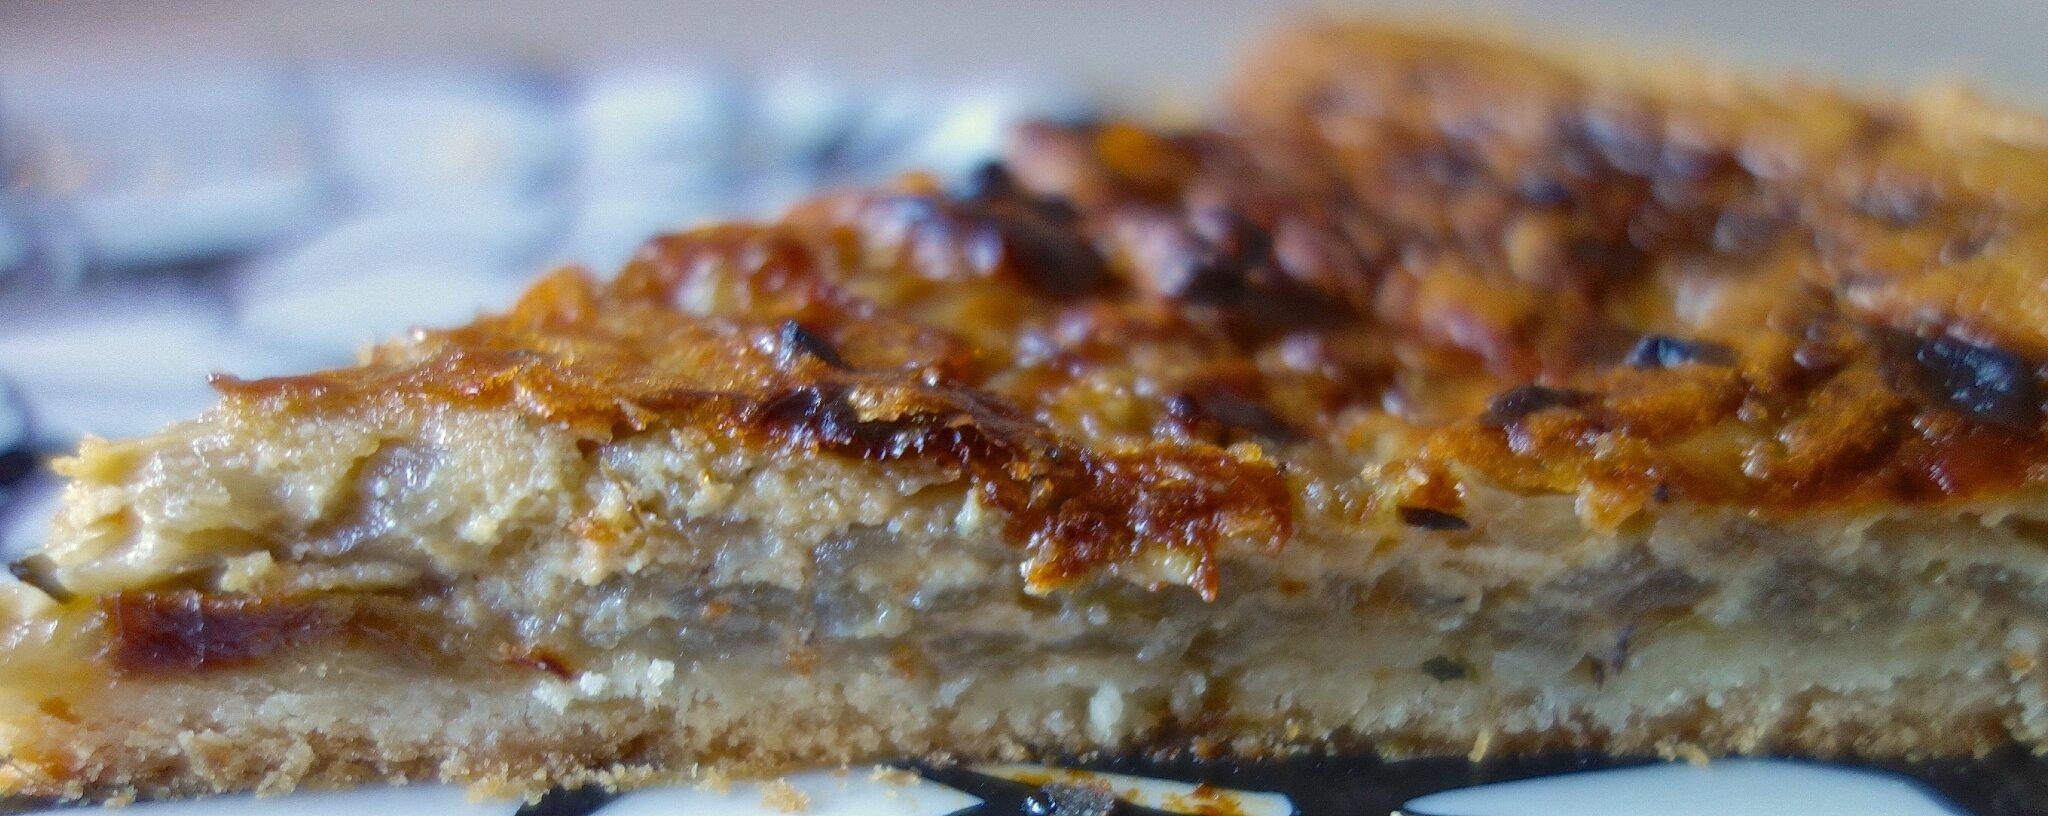 tarte aux oignons de Roscoff